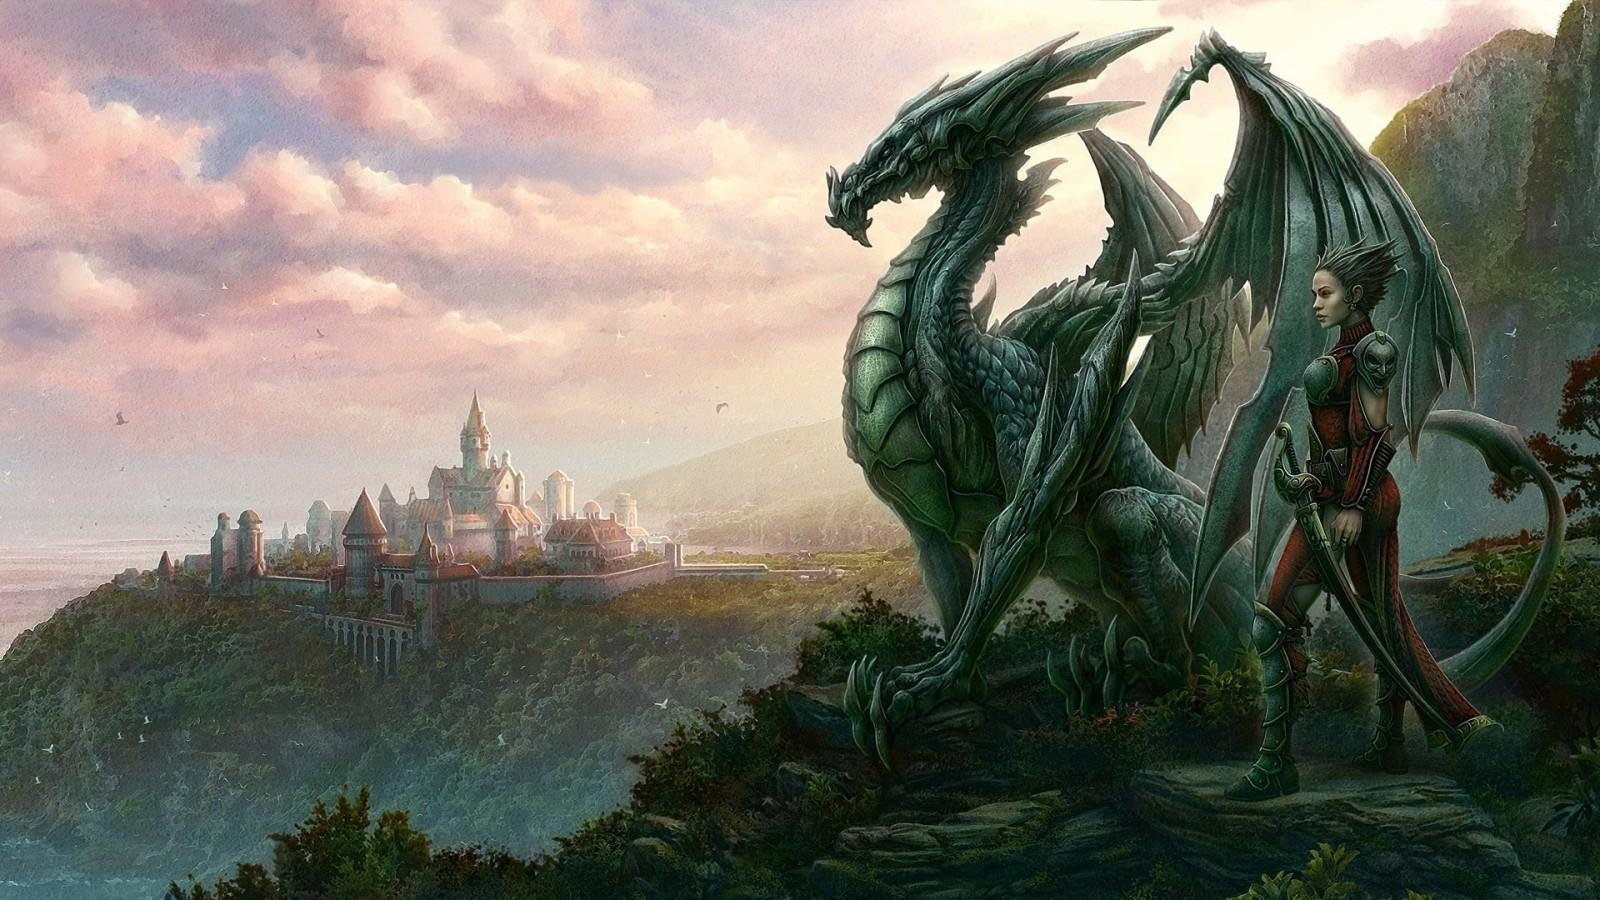 Hd wallpaper dragon - Dragon City Pictures Hd Wallpaper Of Cartoon Hdwallpaper2013